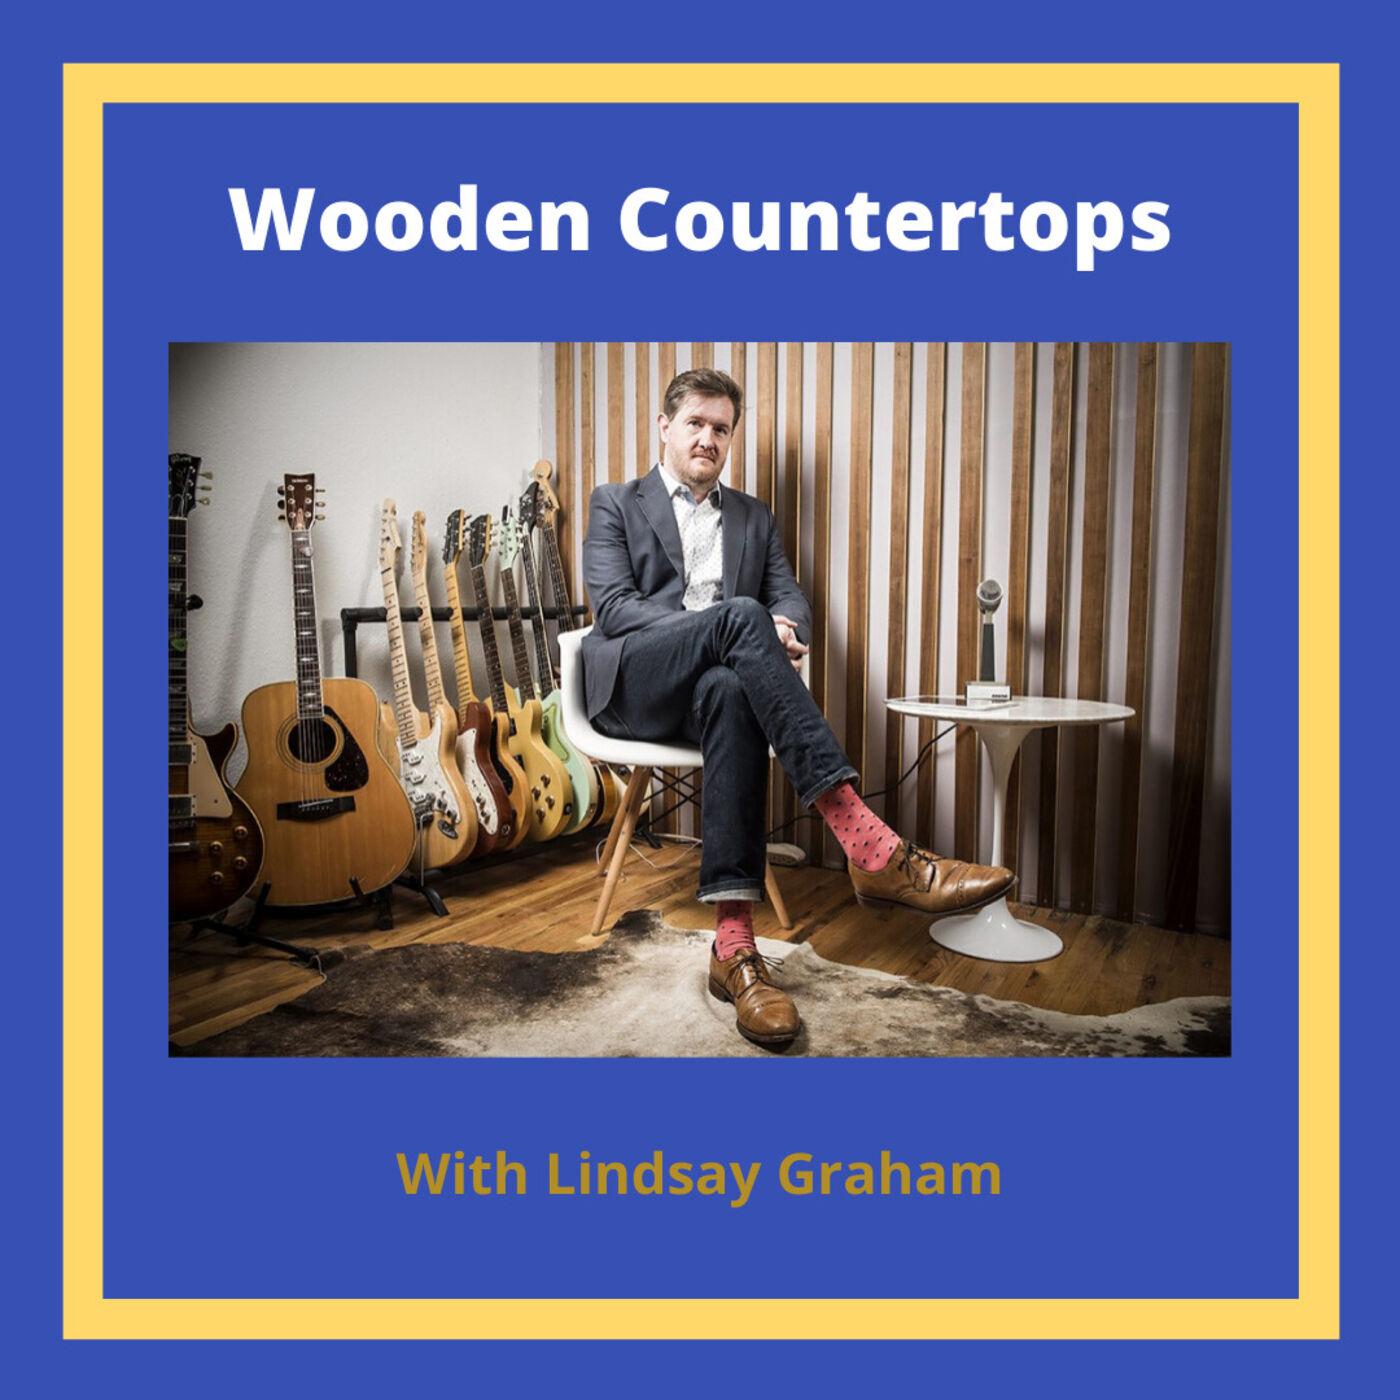 Bonus: Tale of a Wooden Countertop from Lindsay Graham (not that Lindsay Graham)